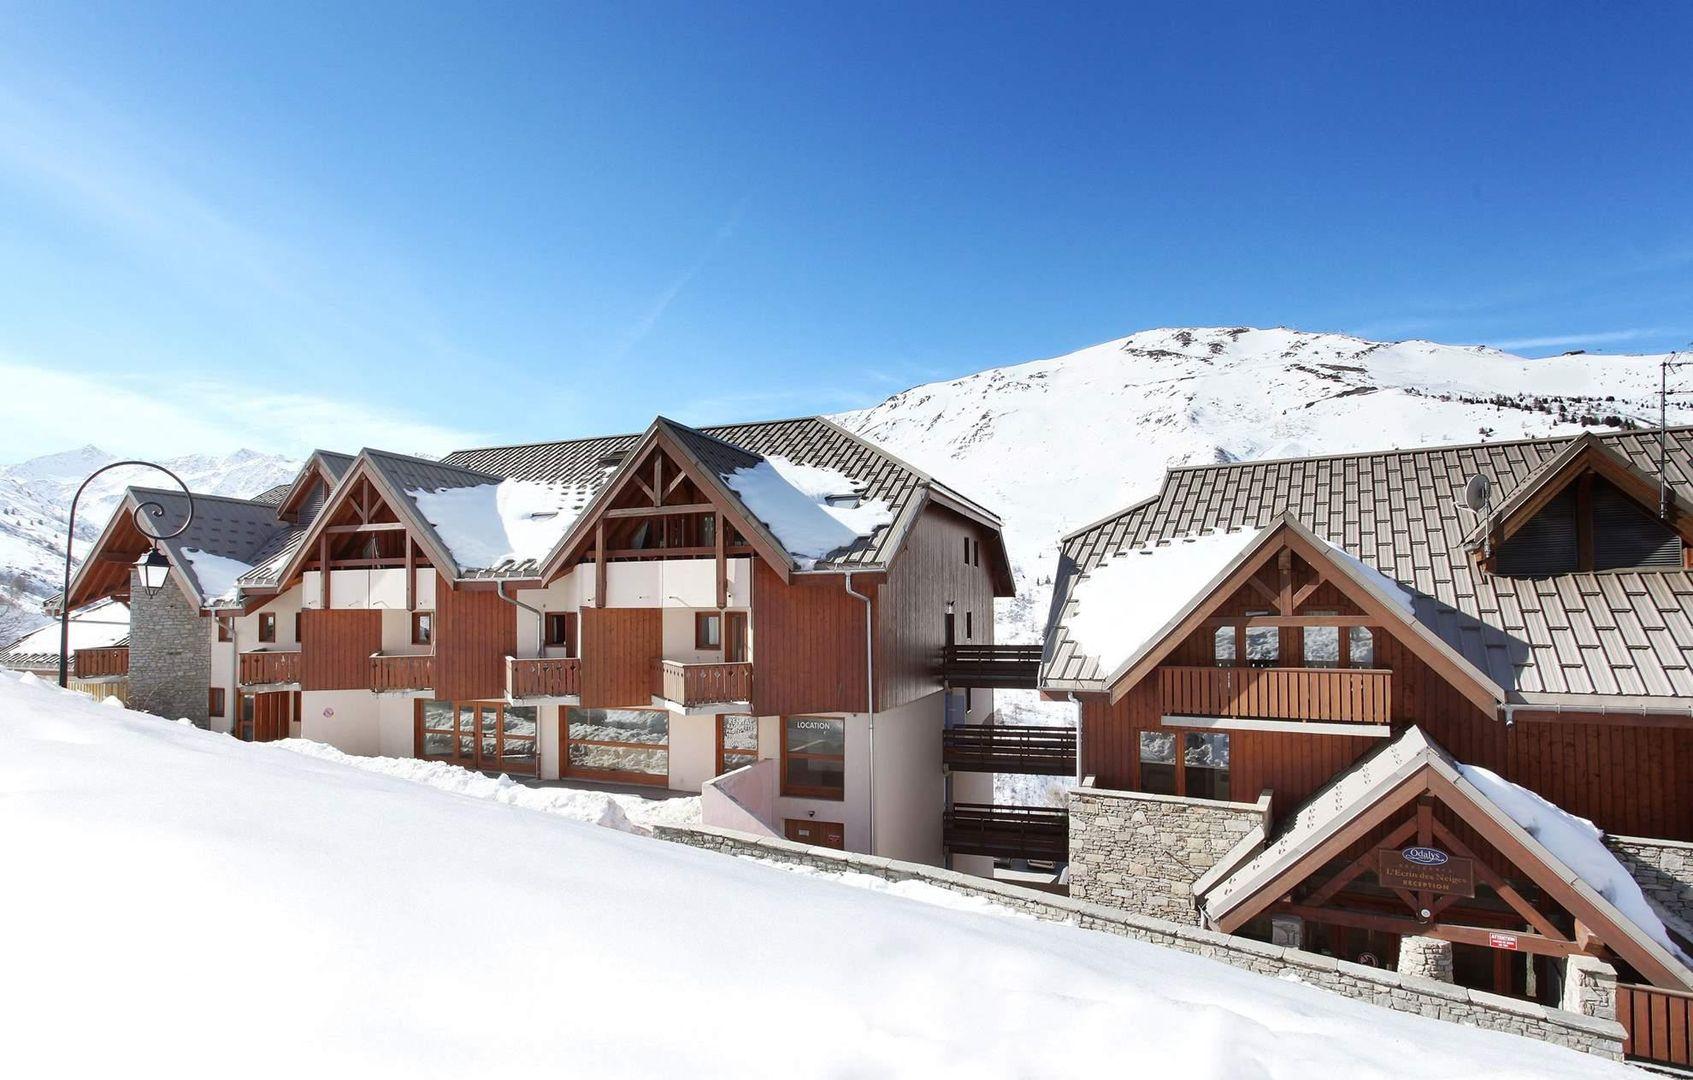 Meer info over Résidence L'Ecrin des Neiges  bij Wintertrex